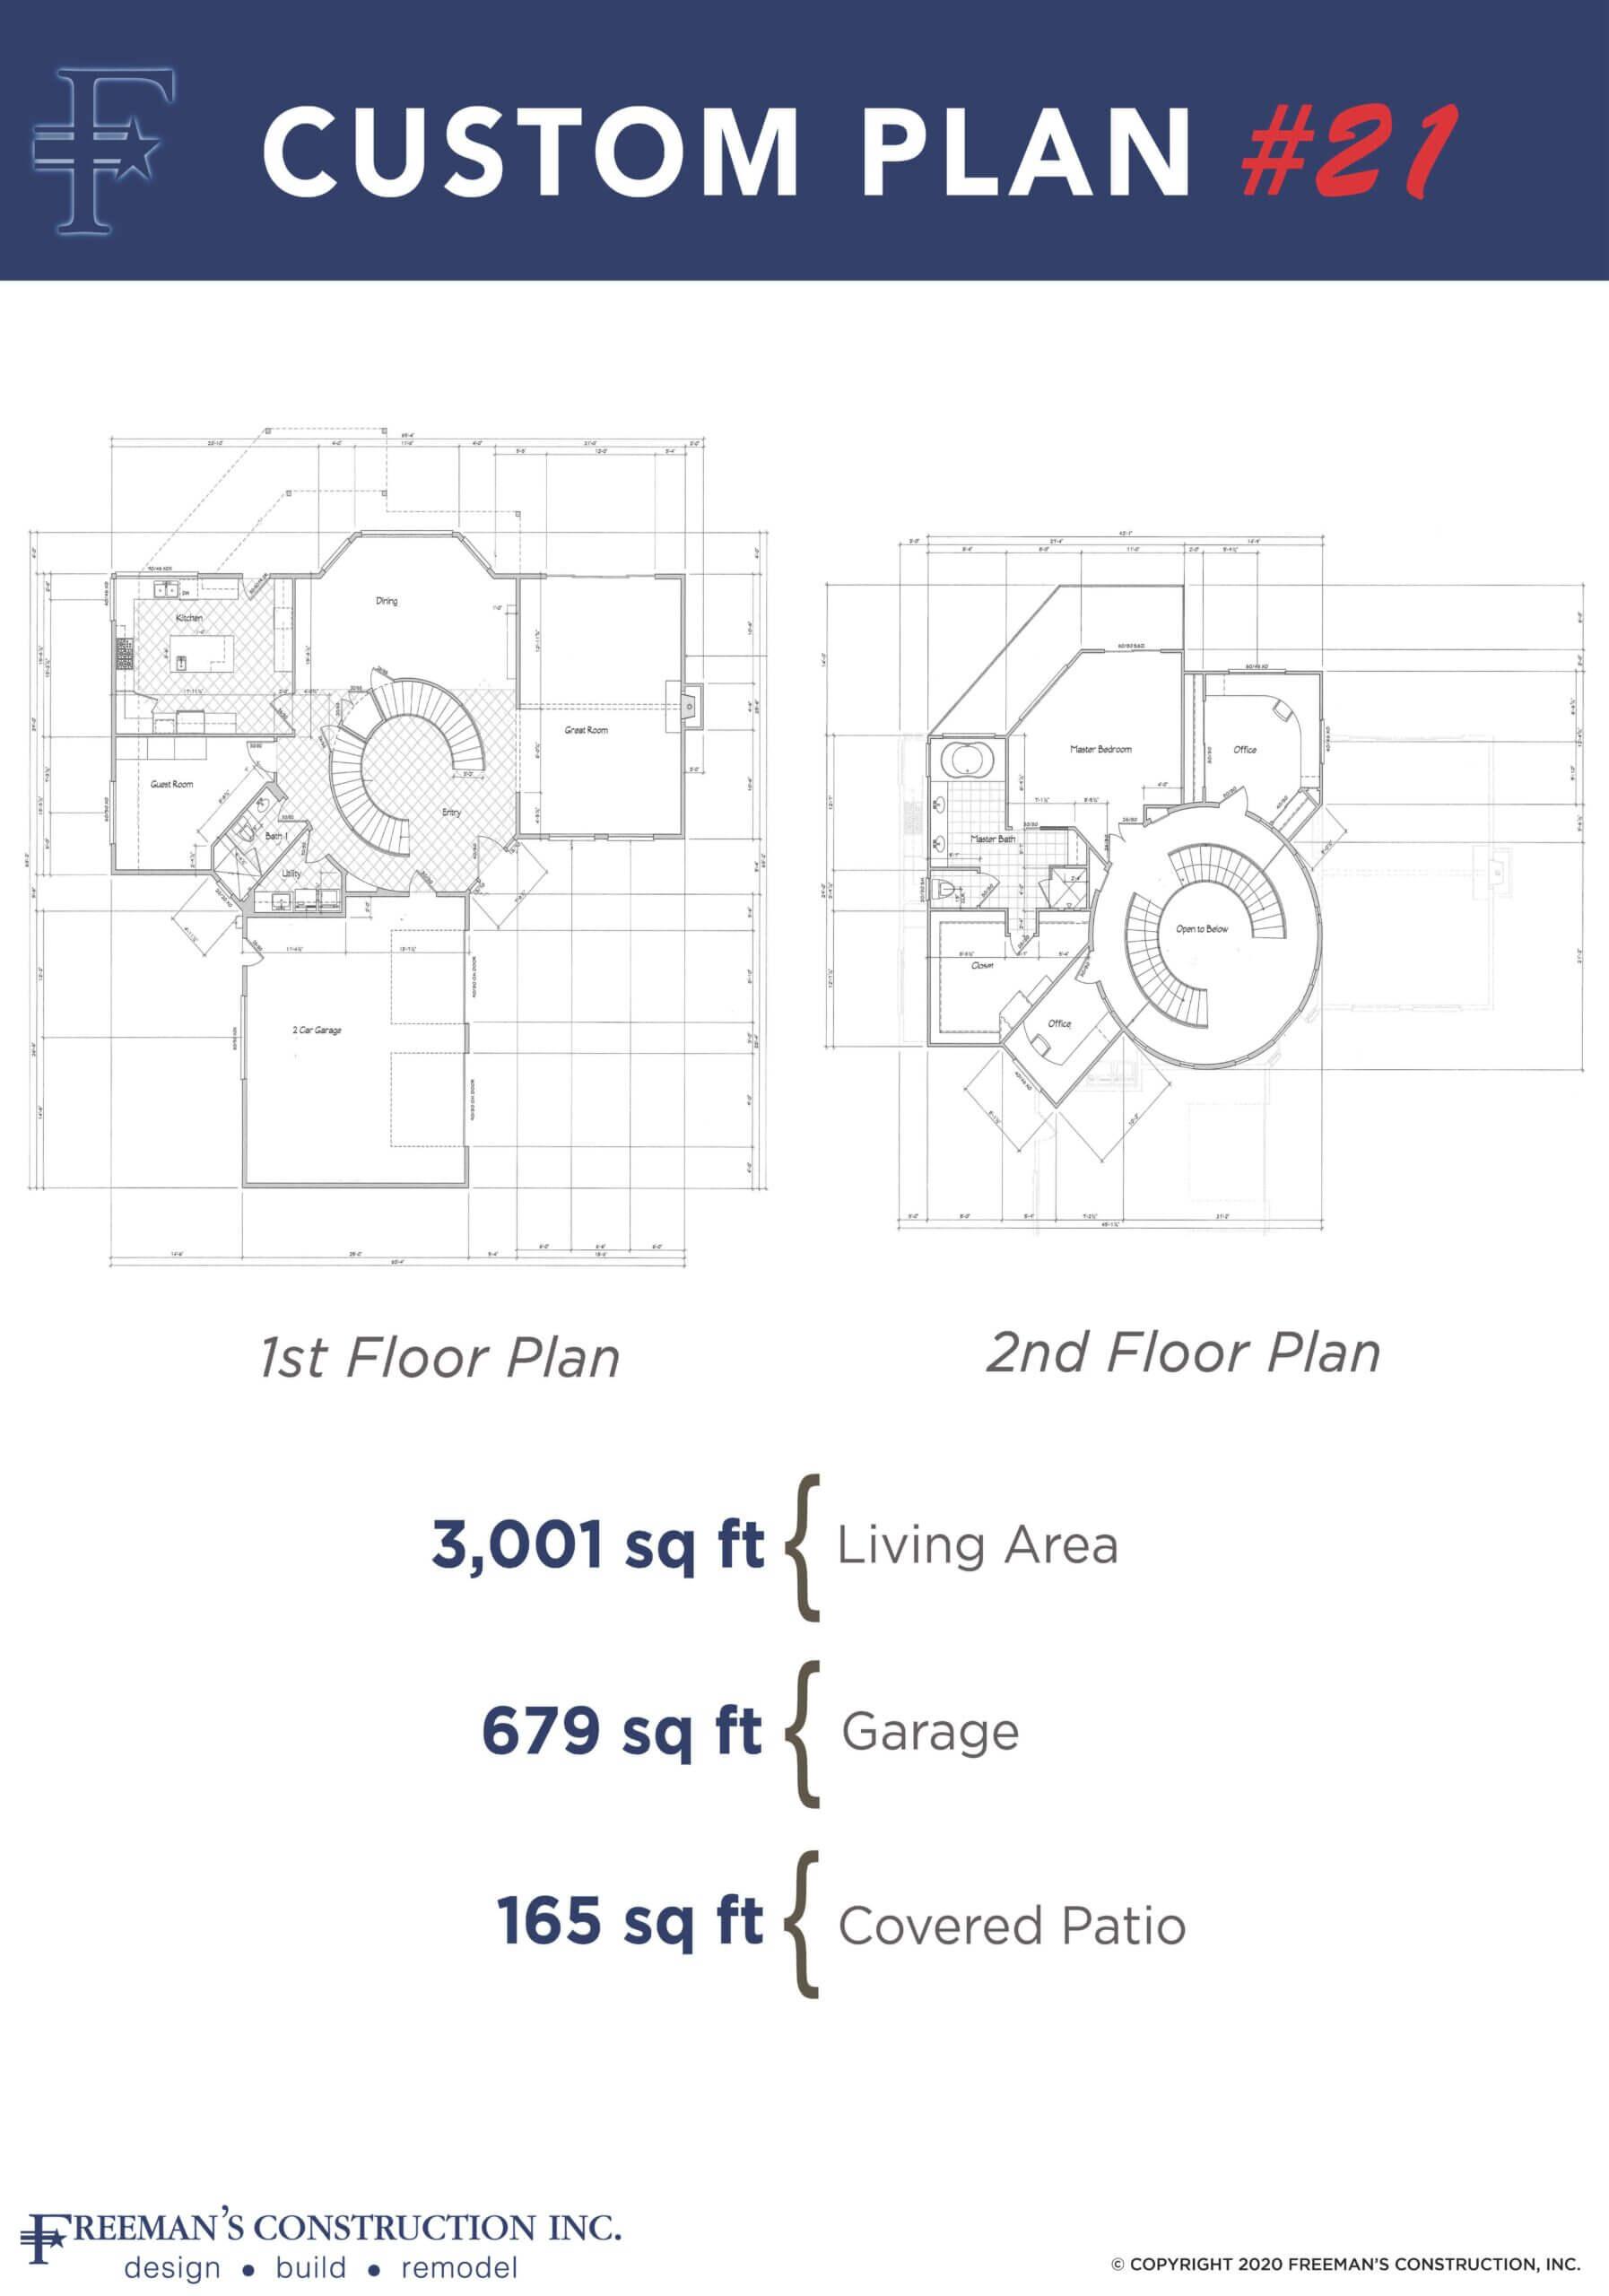 custom-home-floor-plan-21-freemans-construction-inc